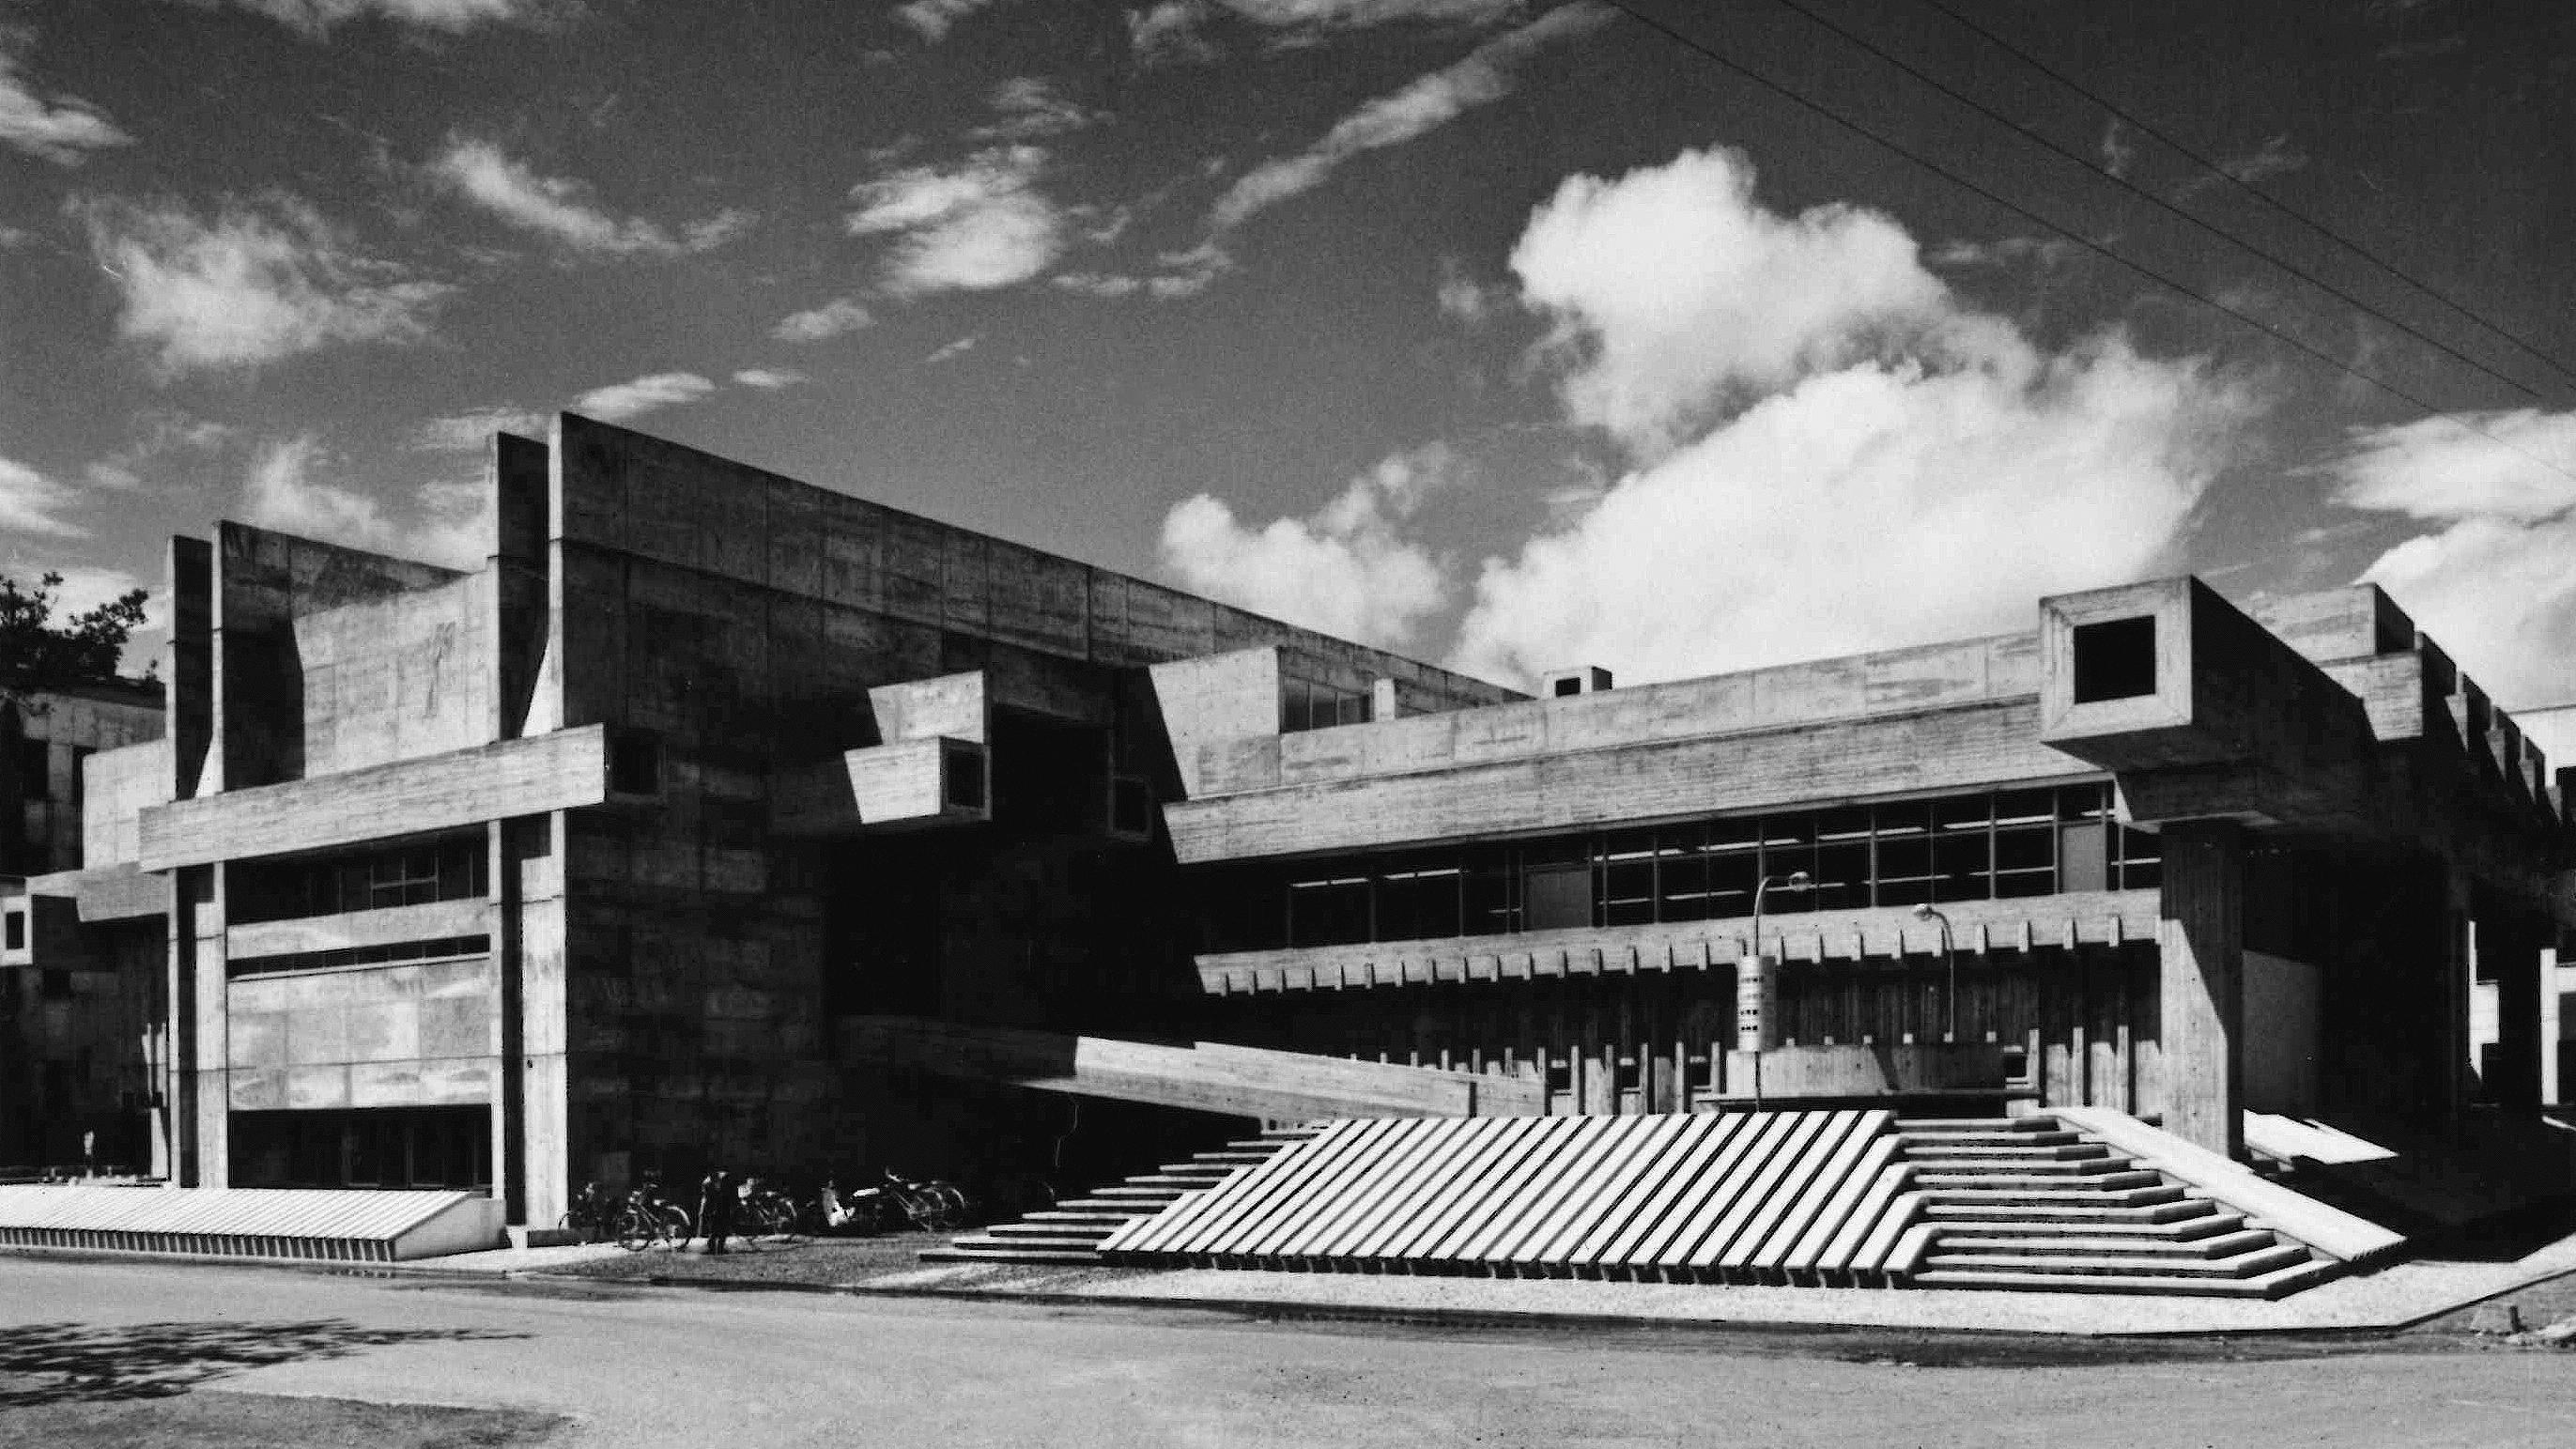 Wiederaufbau nach dem Krieg: Bibliothek in Ōita (1962-66)